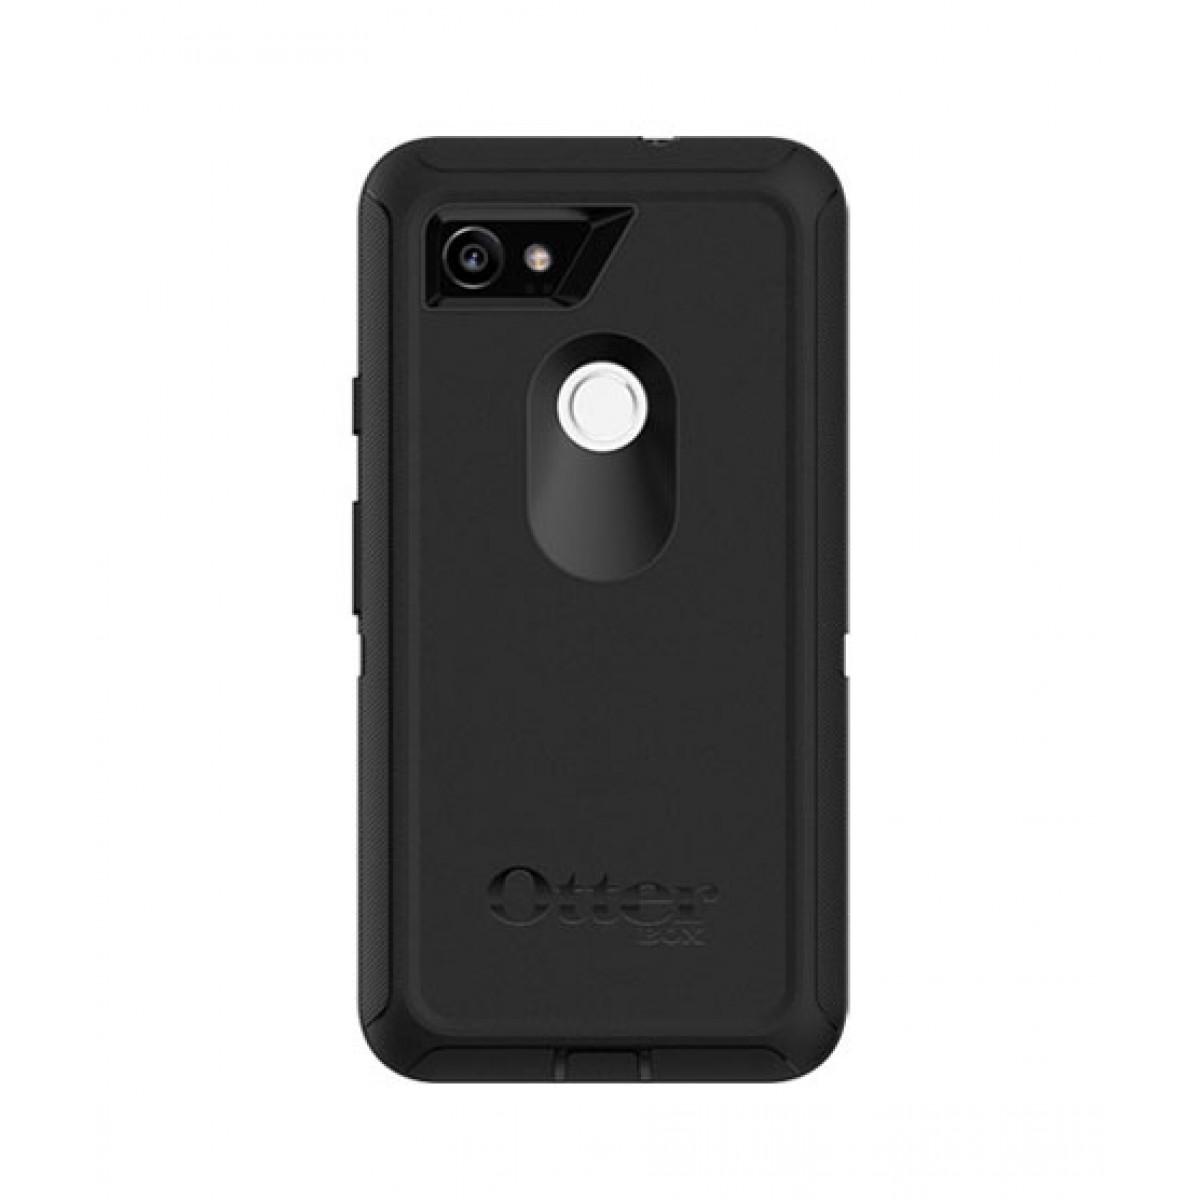 newest 30704 c4abb OtterBox Defender Series Black Case For Google Pixel 2 XL